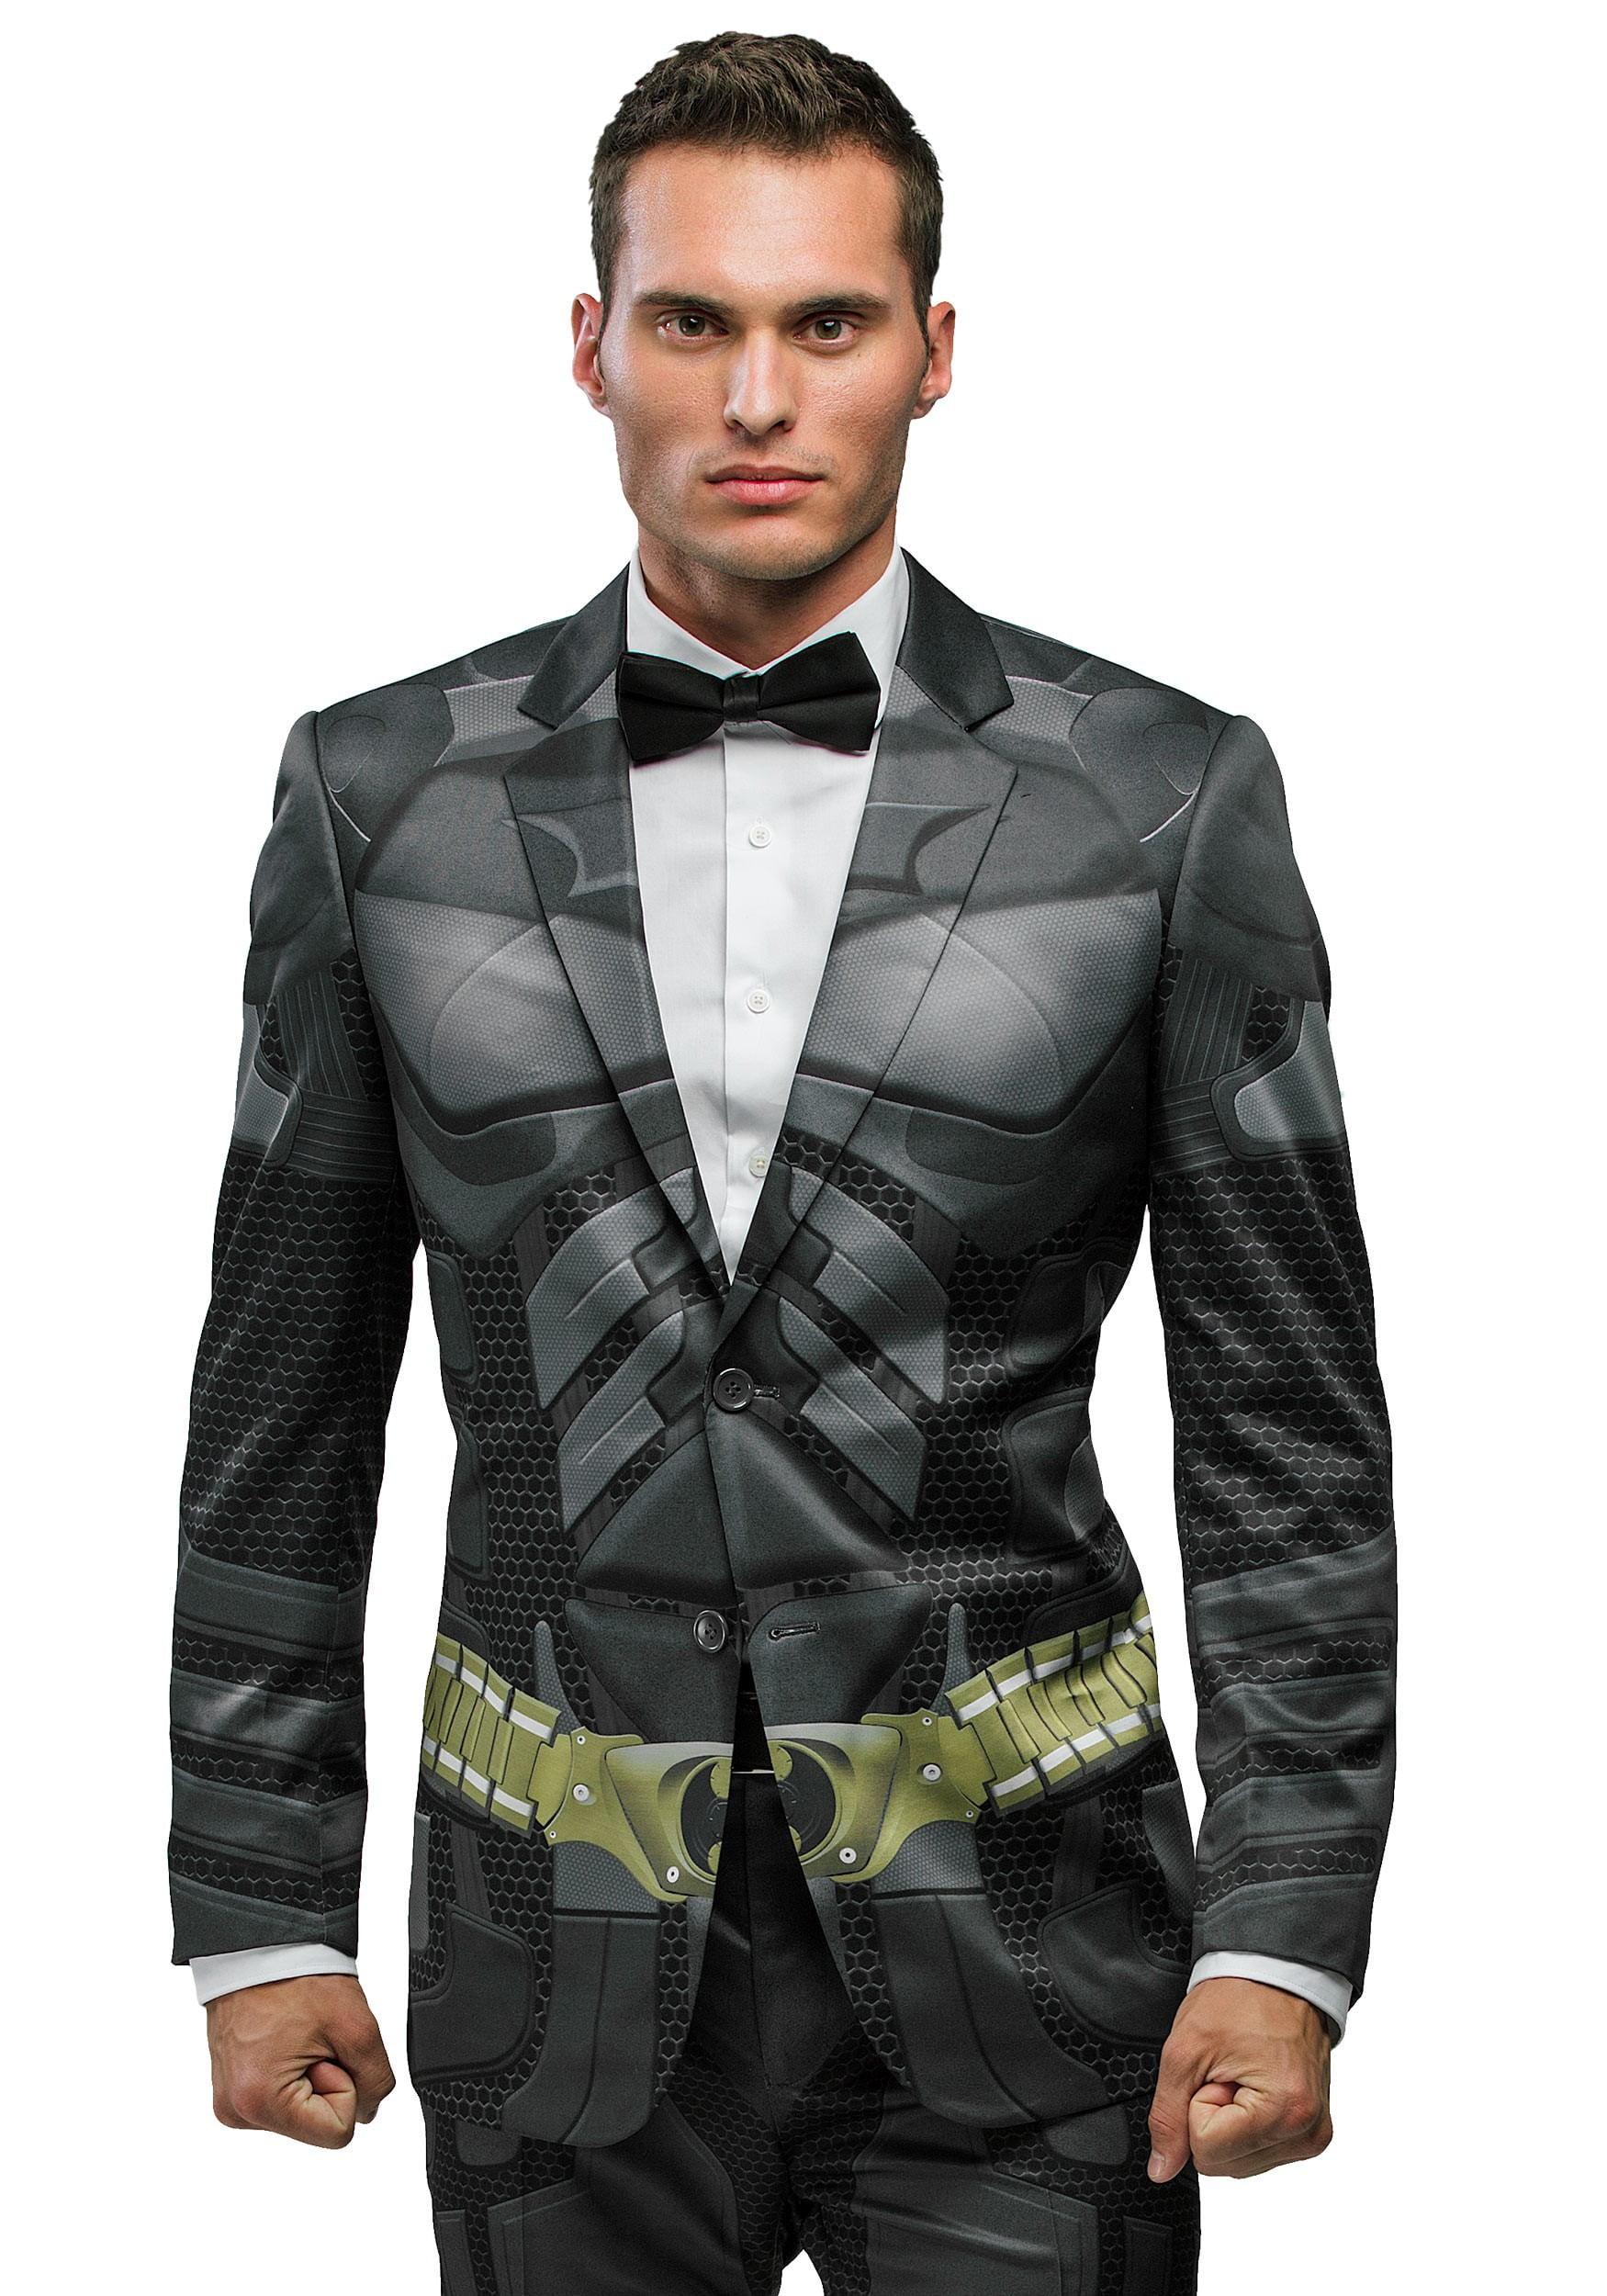 Batman Dark Knight Vest and Bowtie